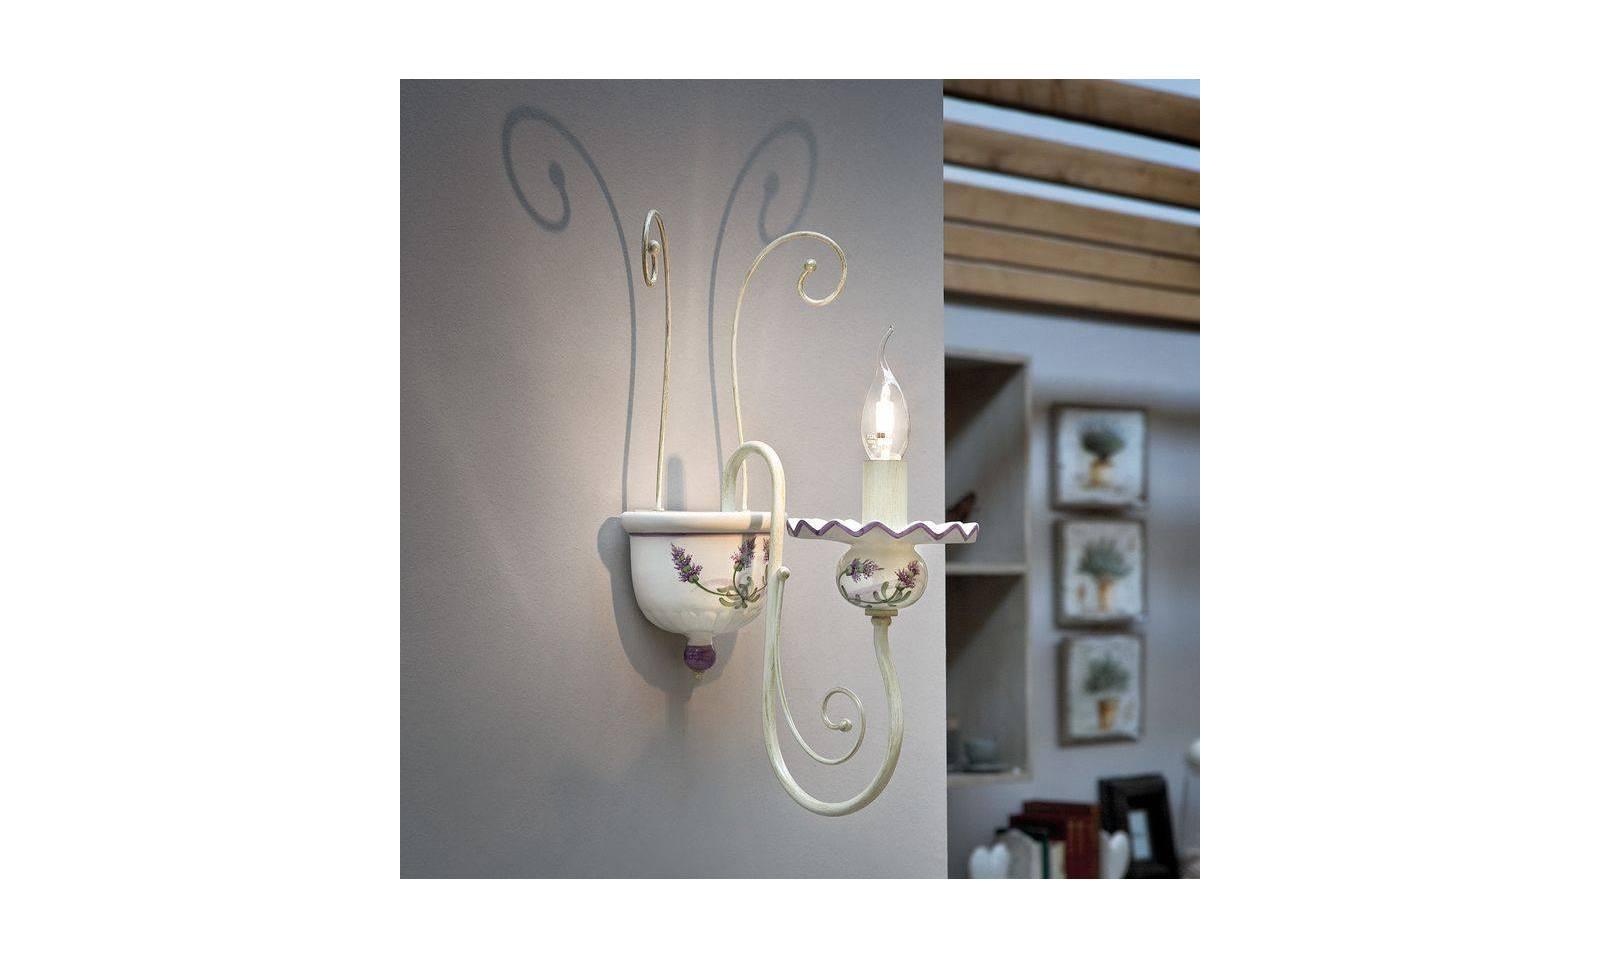 lampade da parete per l'ingresso classico